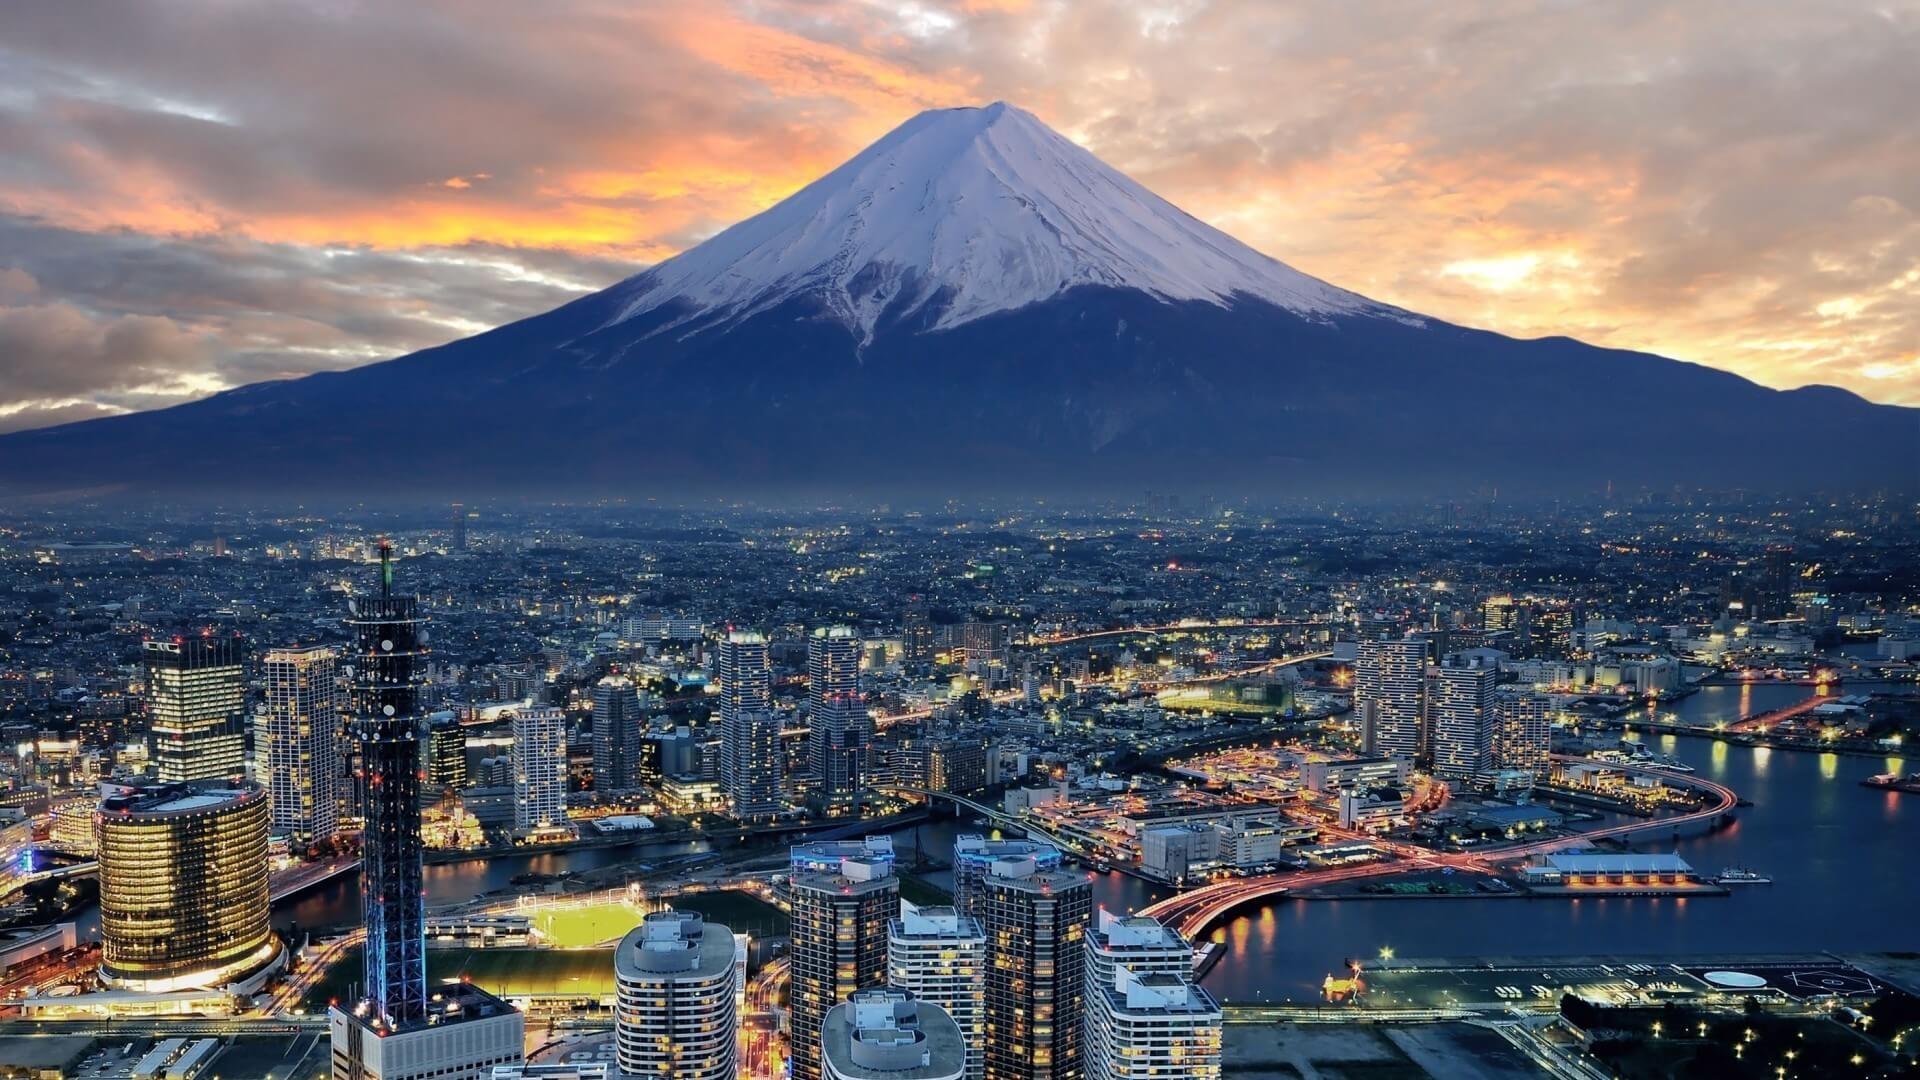 Japan Wallpaper Image